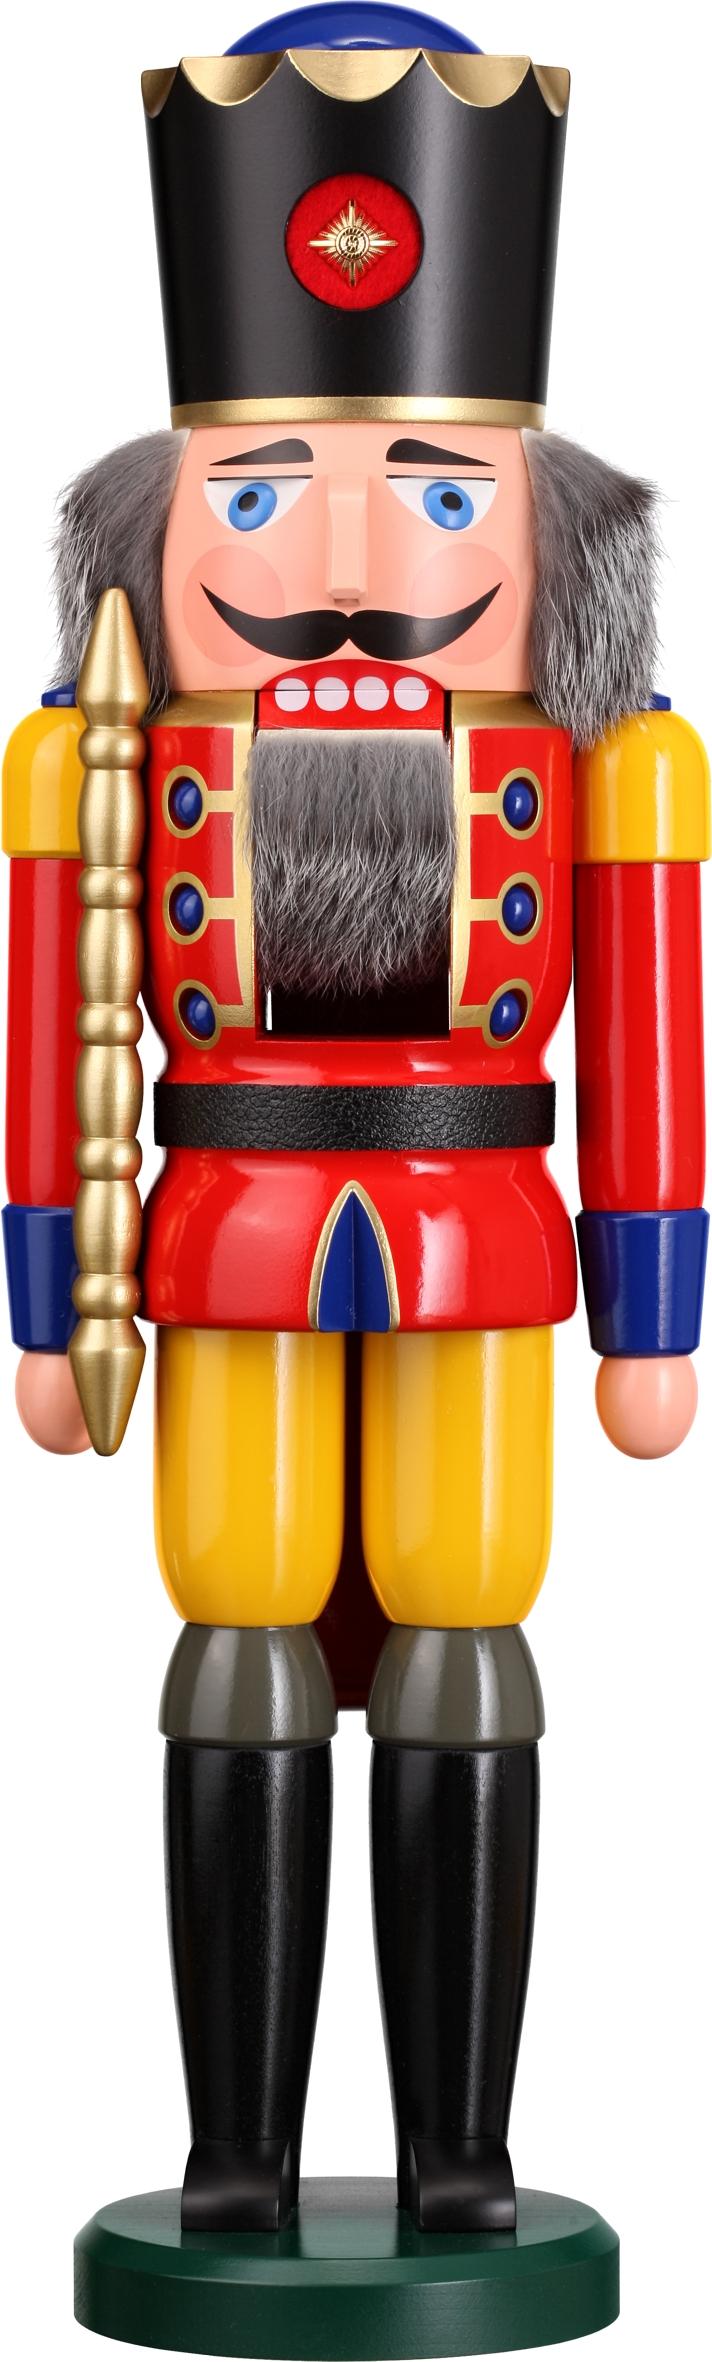 Nussknacker König in roter Farbe